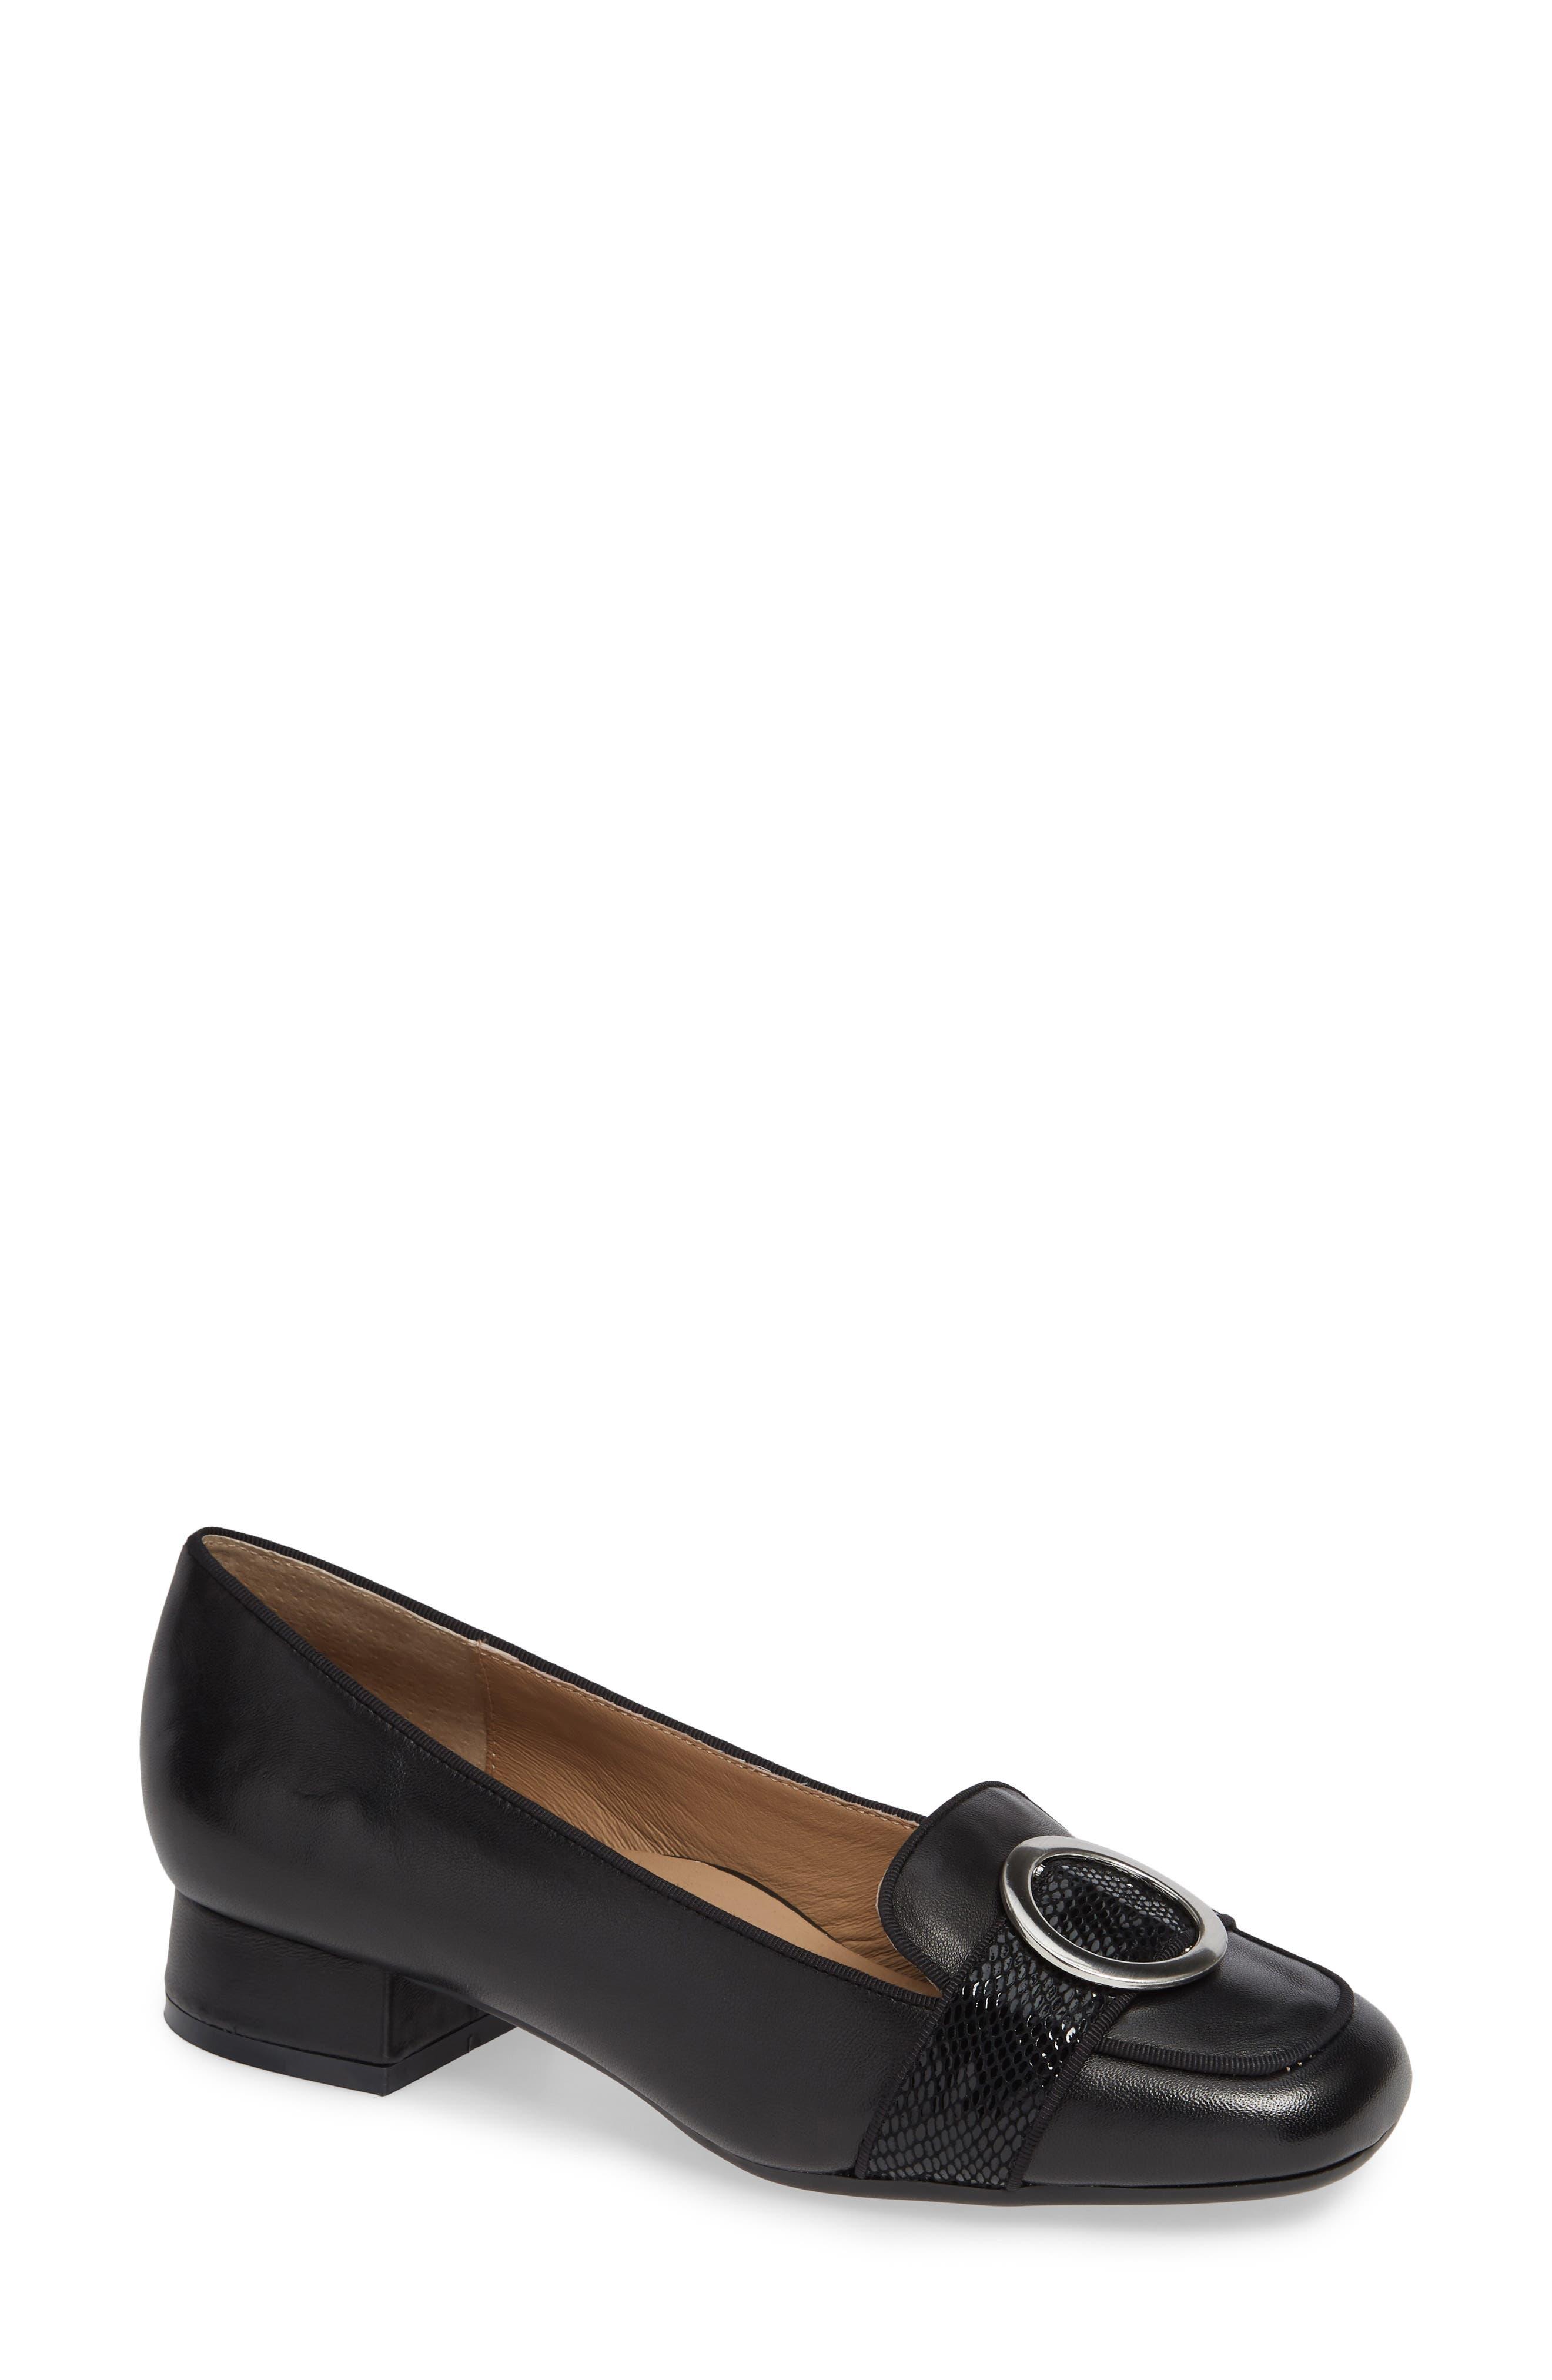 Bettye Muller Concepts Garbo Loafer, Black